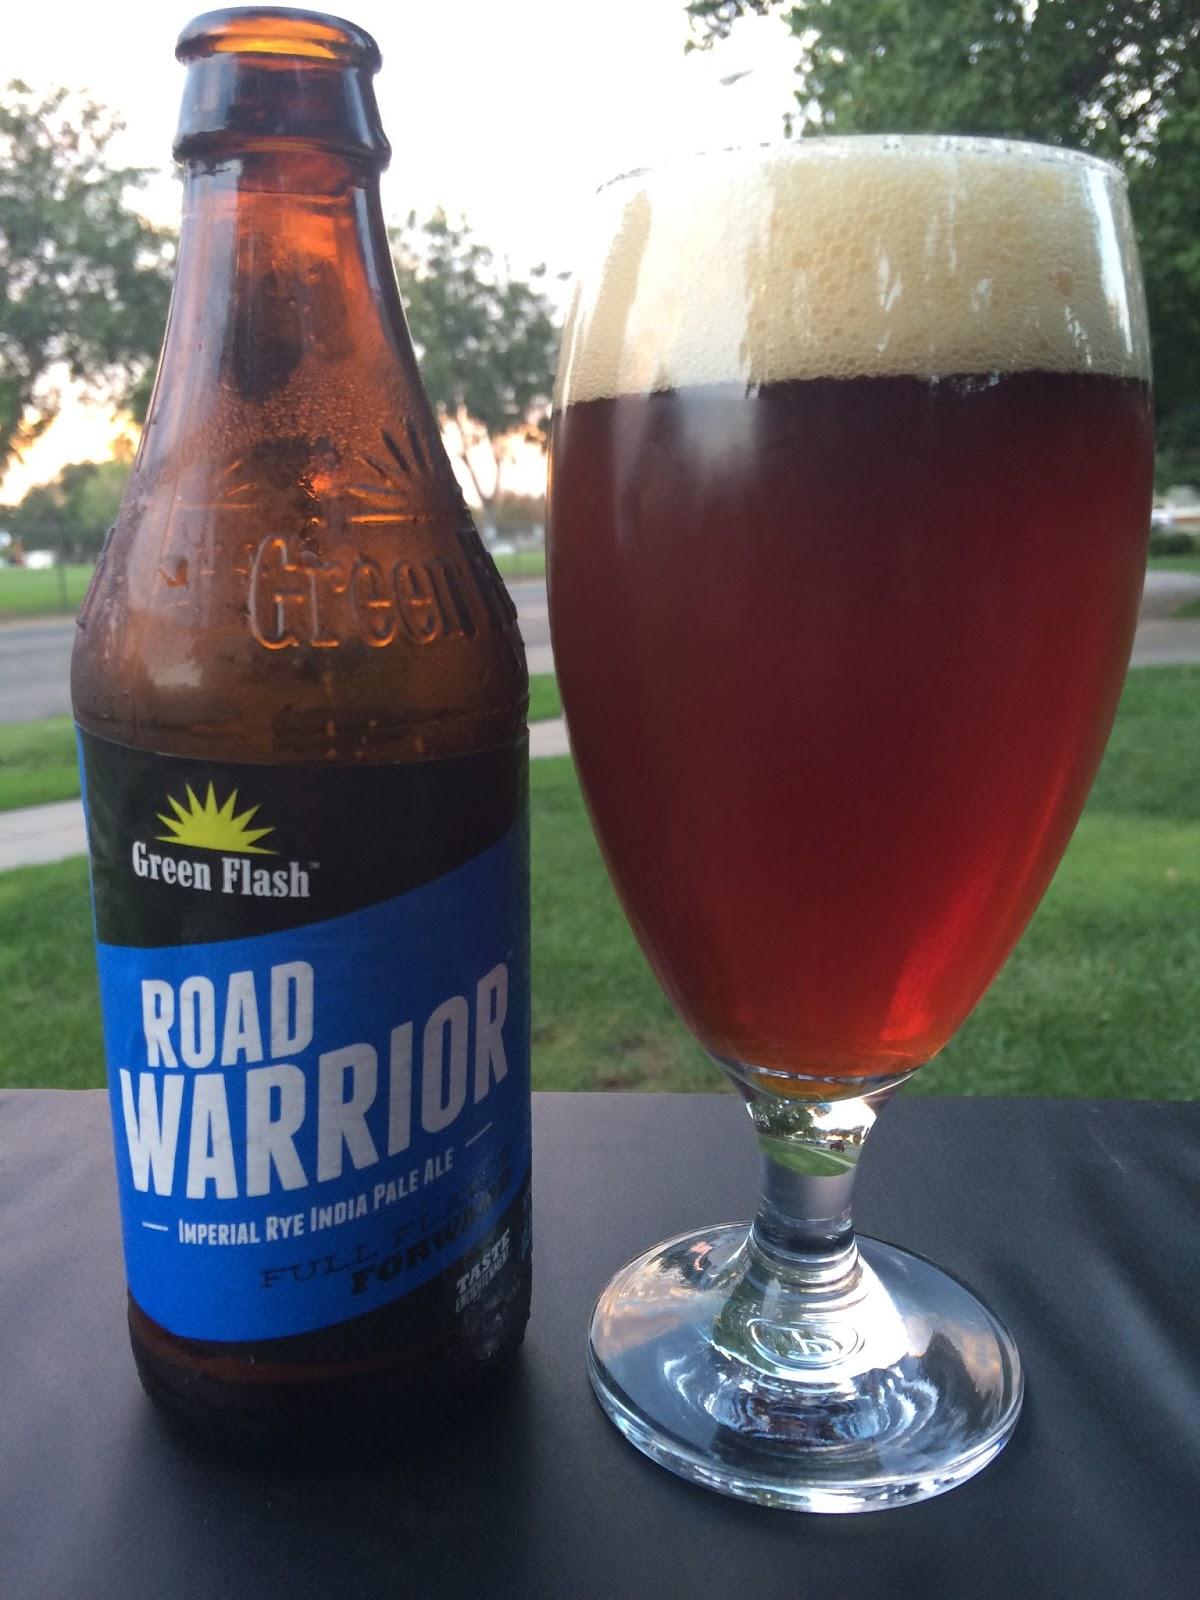 Green Flash Road Warrior Imperial Rye IPA 1